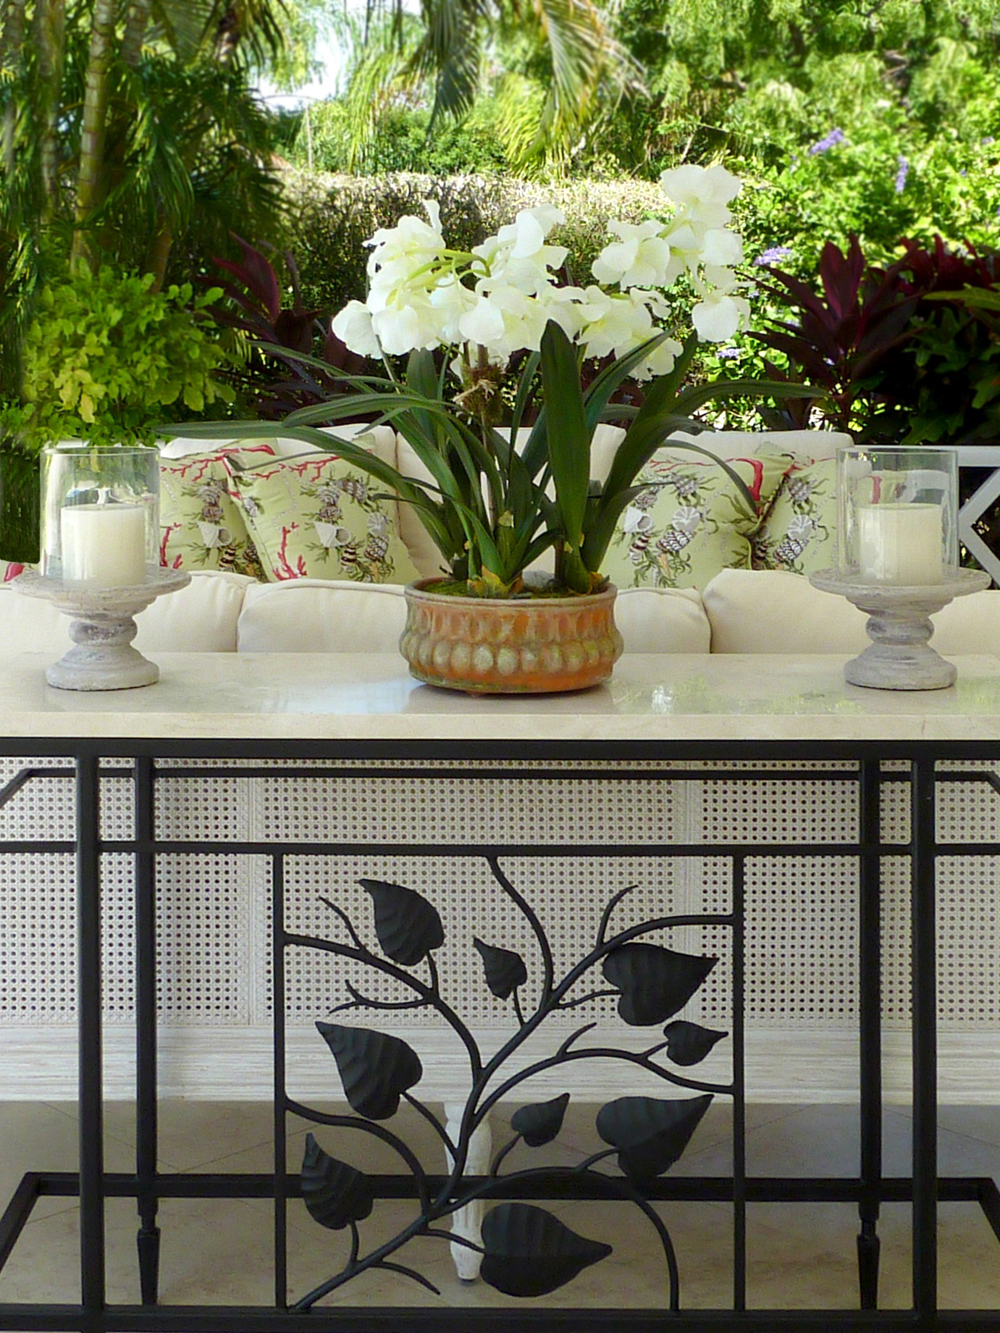 Jenny Blanc Blog - Orchid Arrangement on Wrought Iron Console